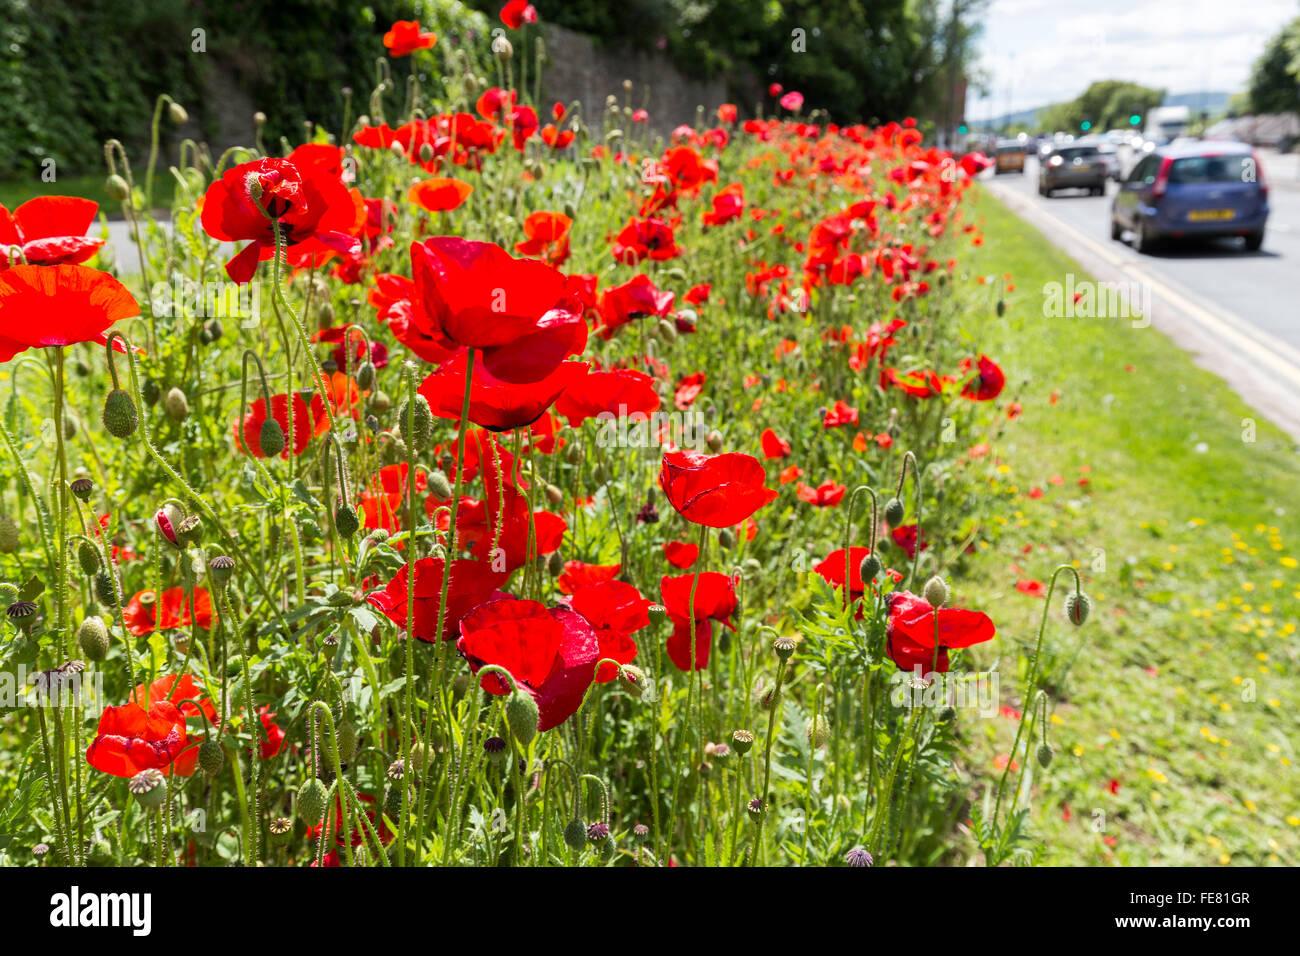 Common poppy growing on roadside verge, Hereford, UK - Stock Image